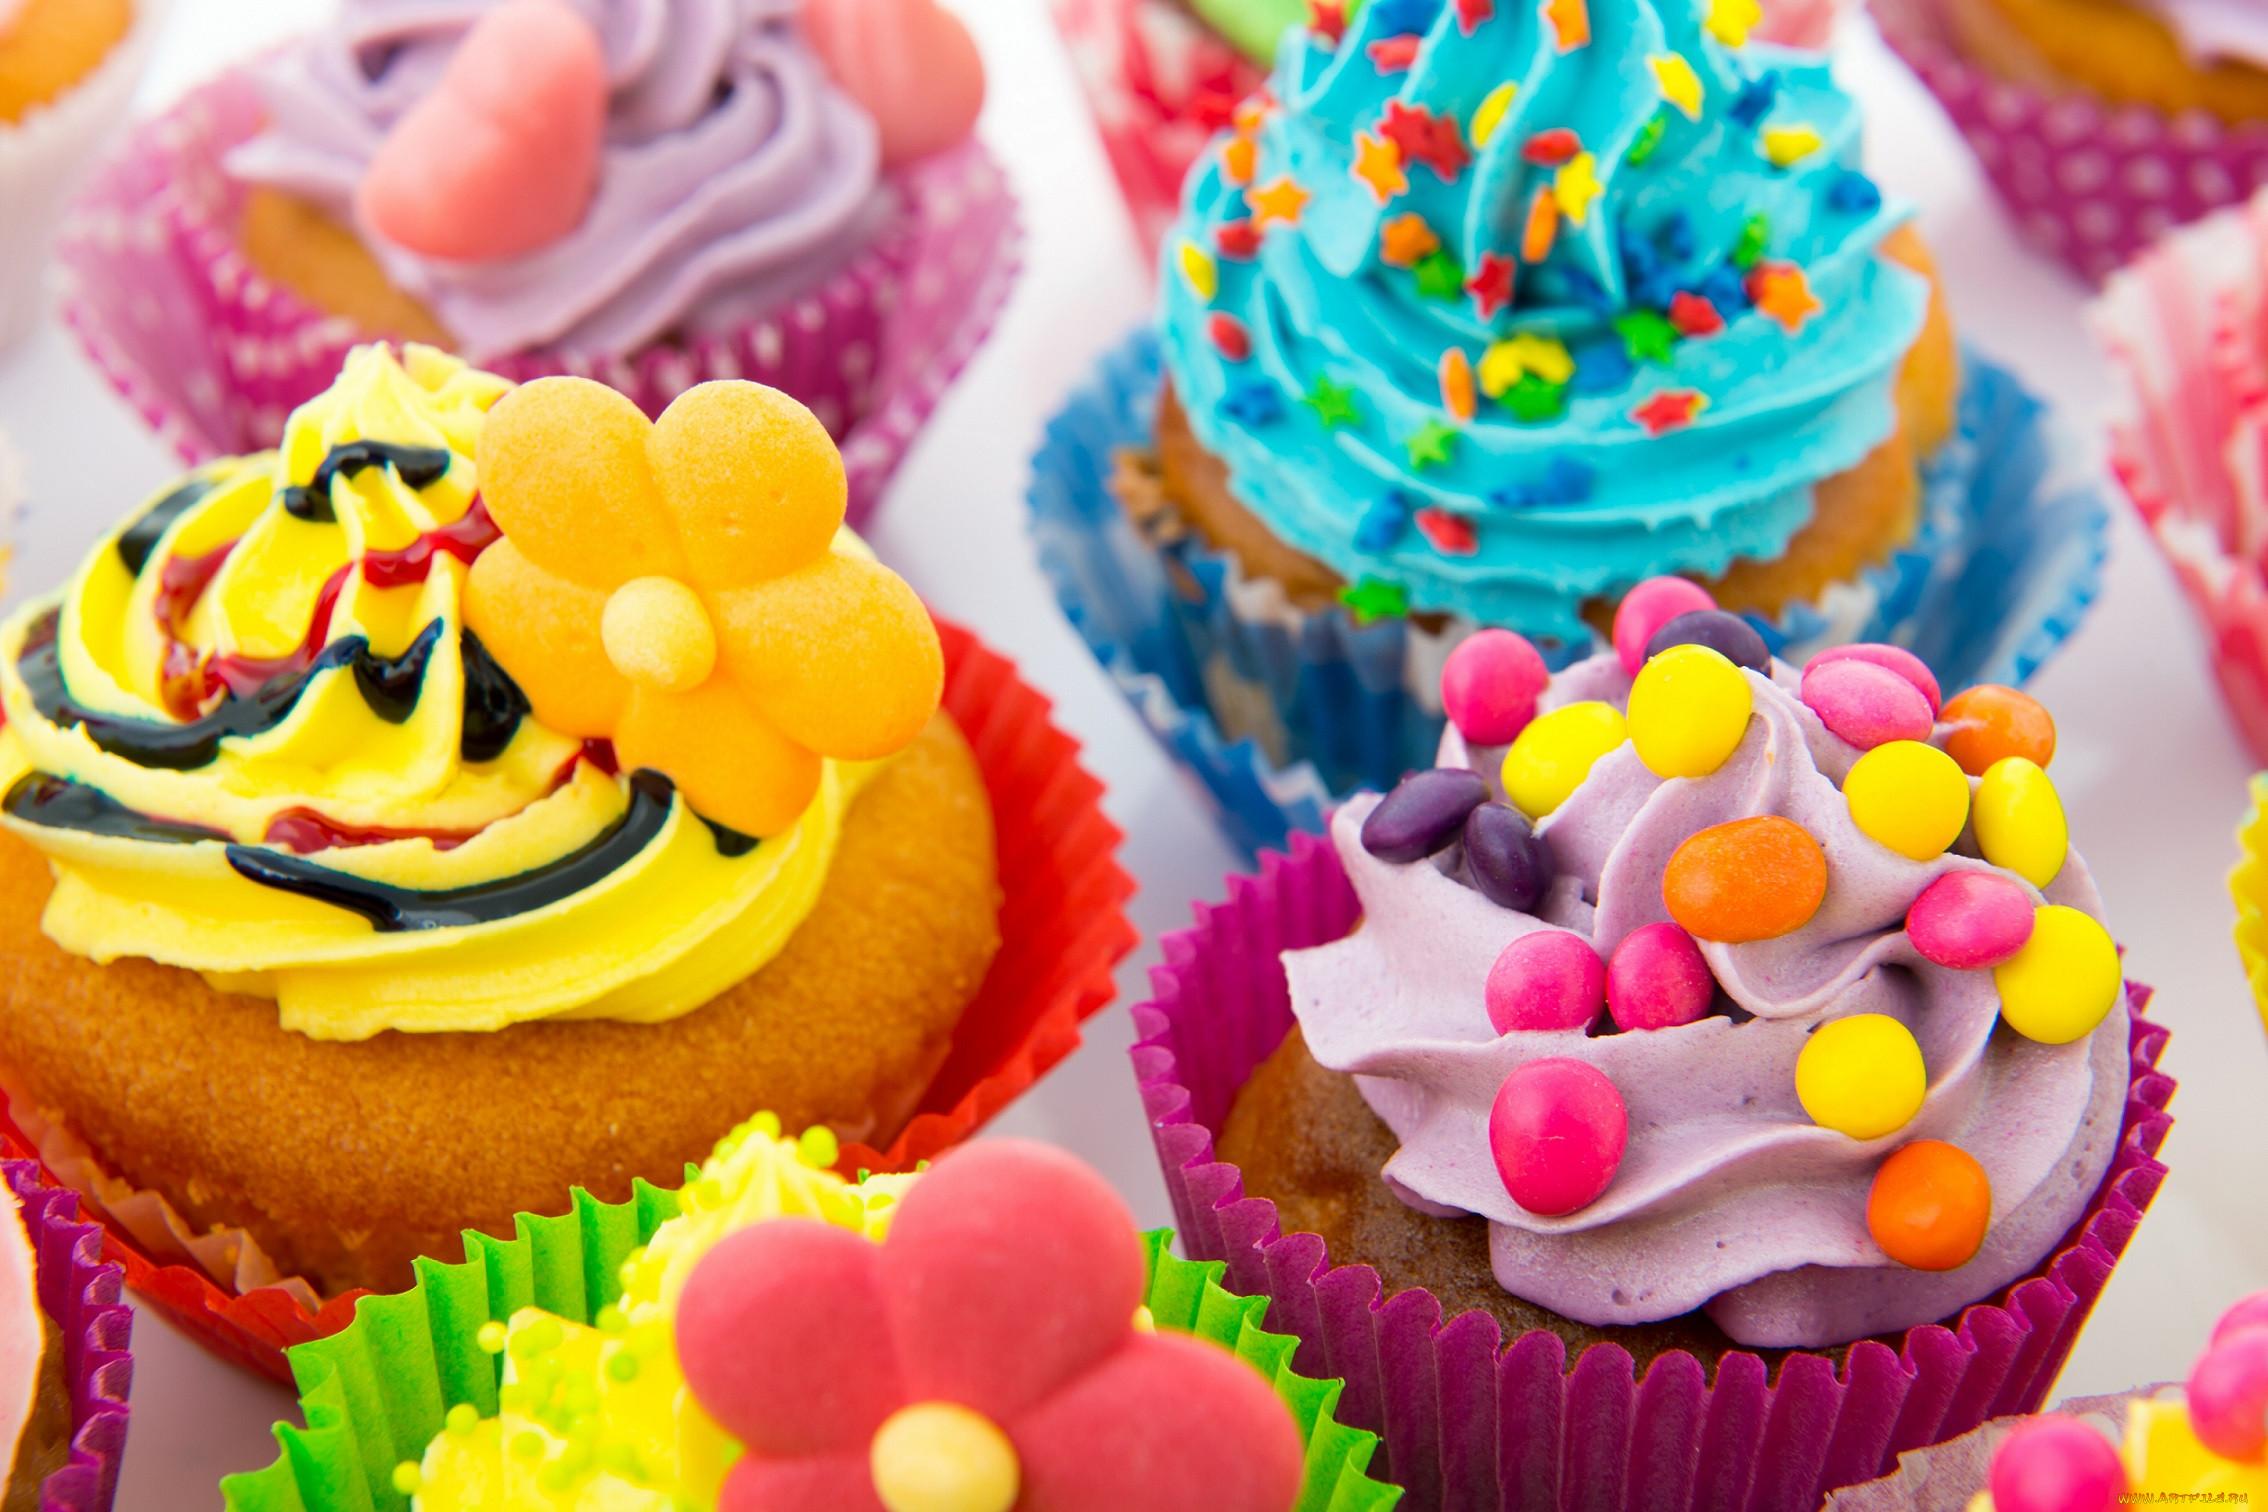 картинки с тортами и пироженками рецепт фото конфитюра